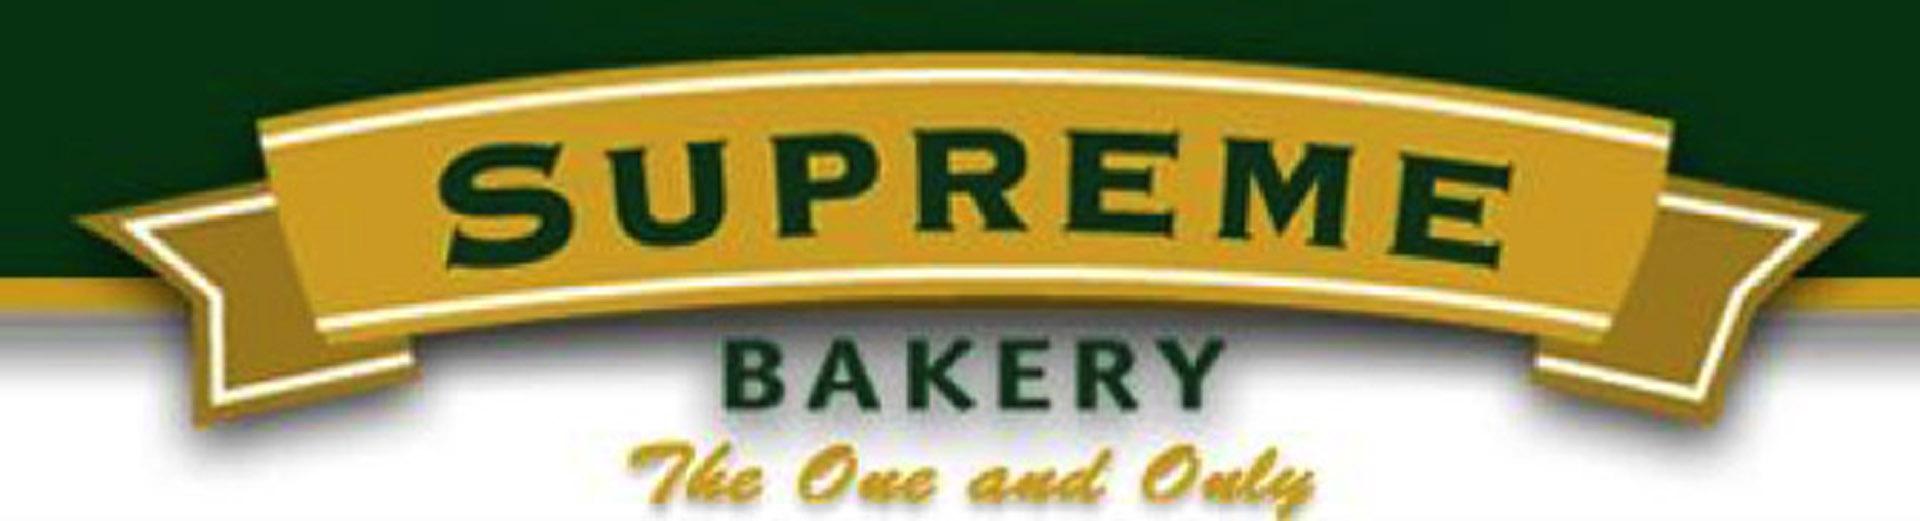 Contributing Partner — Supreme Bakery    http://www.supremebakery.com/